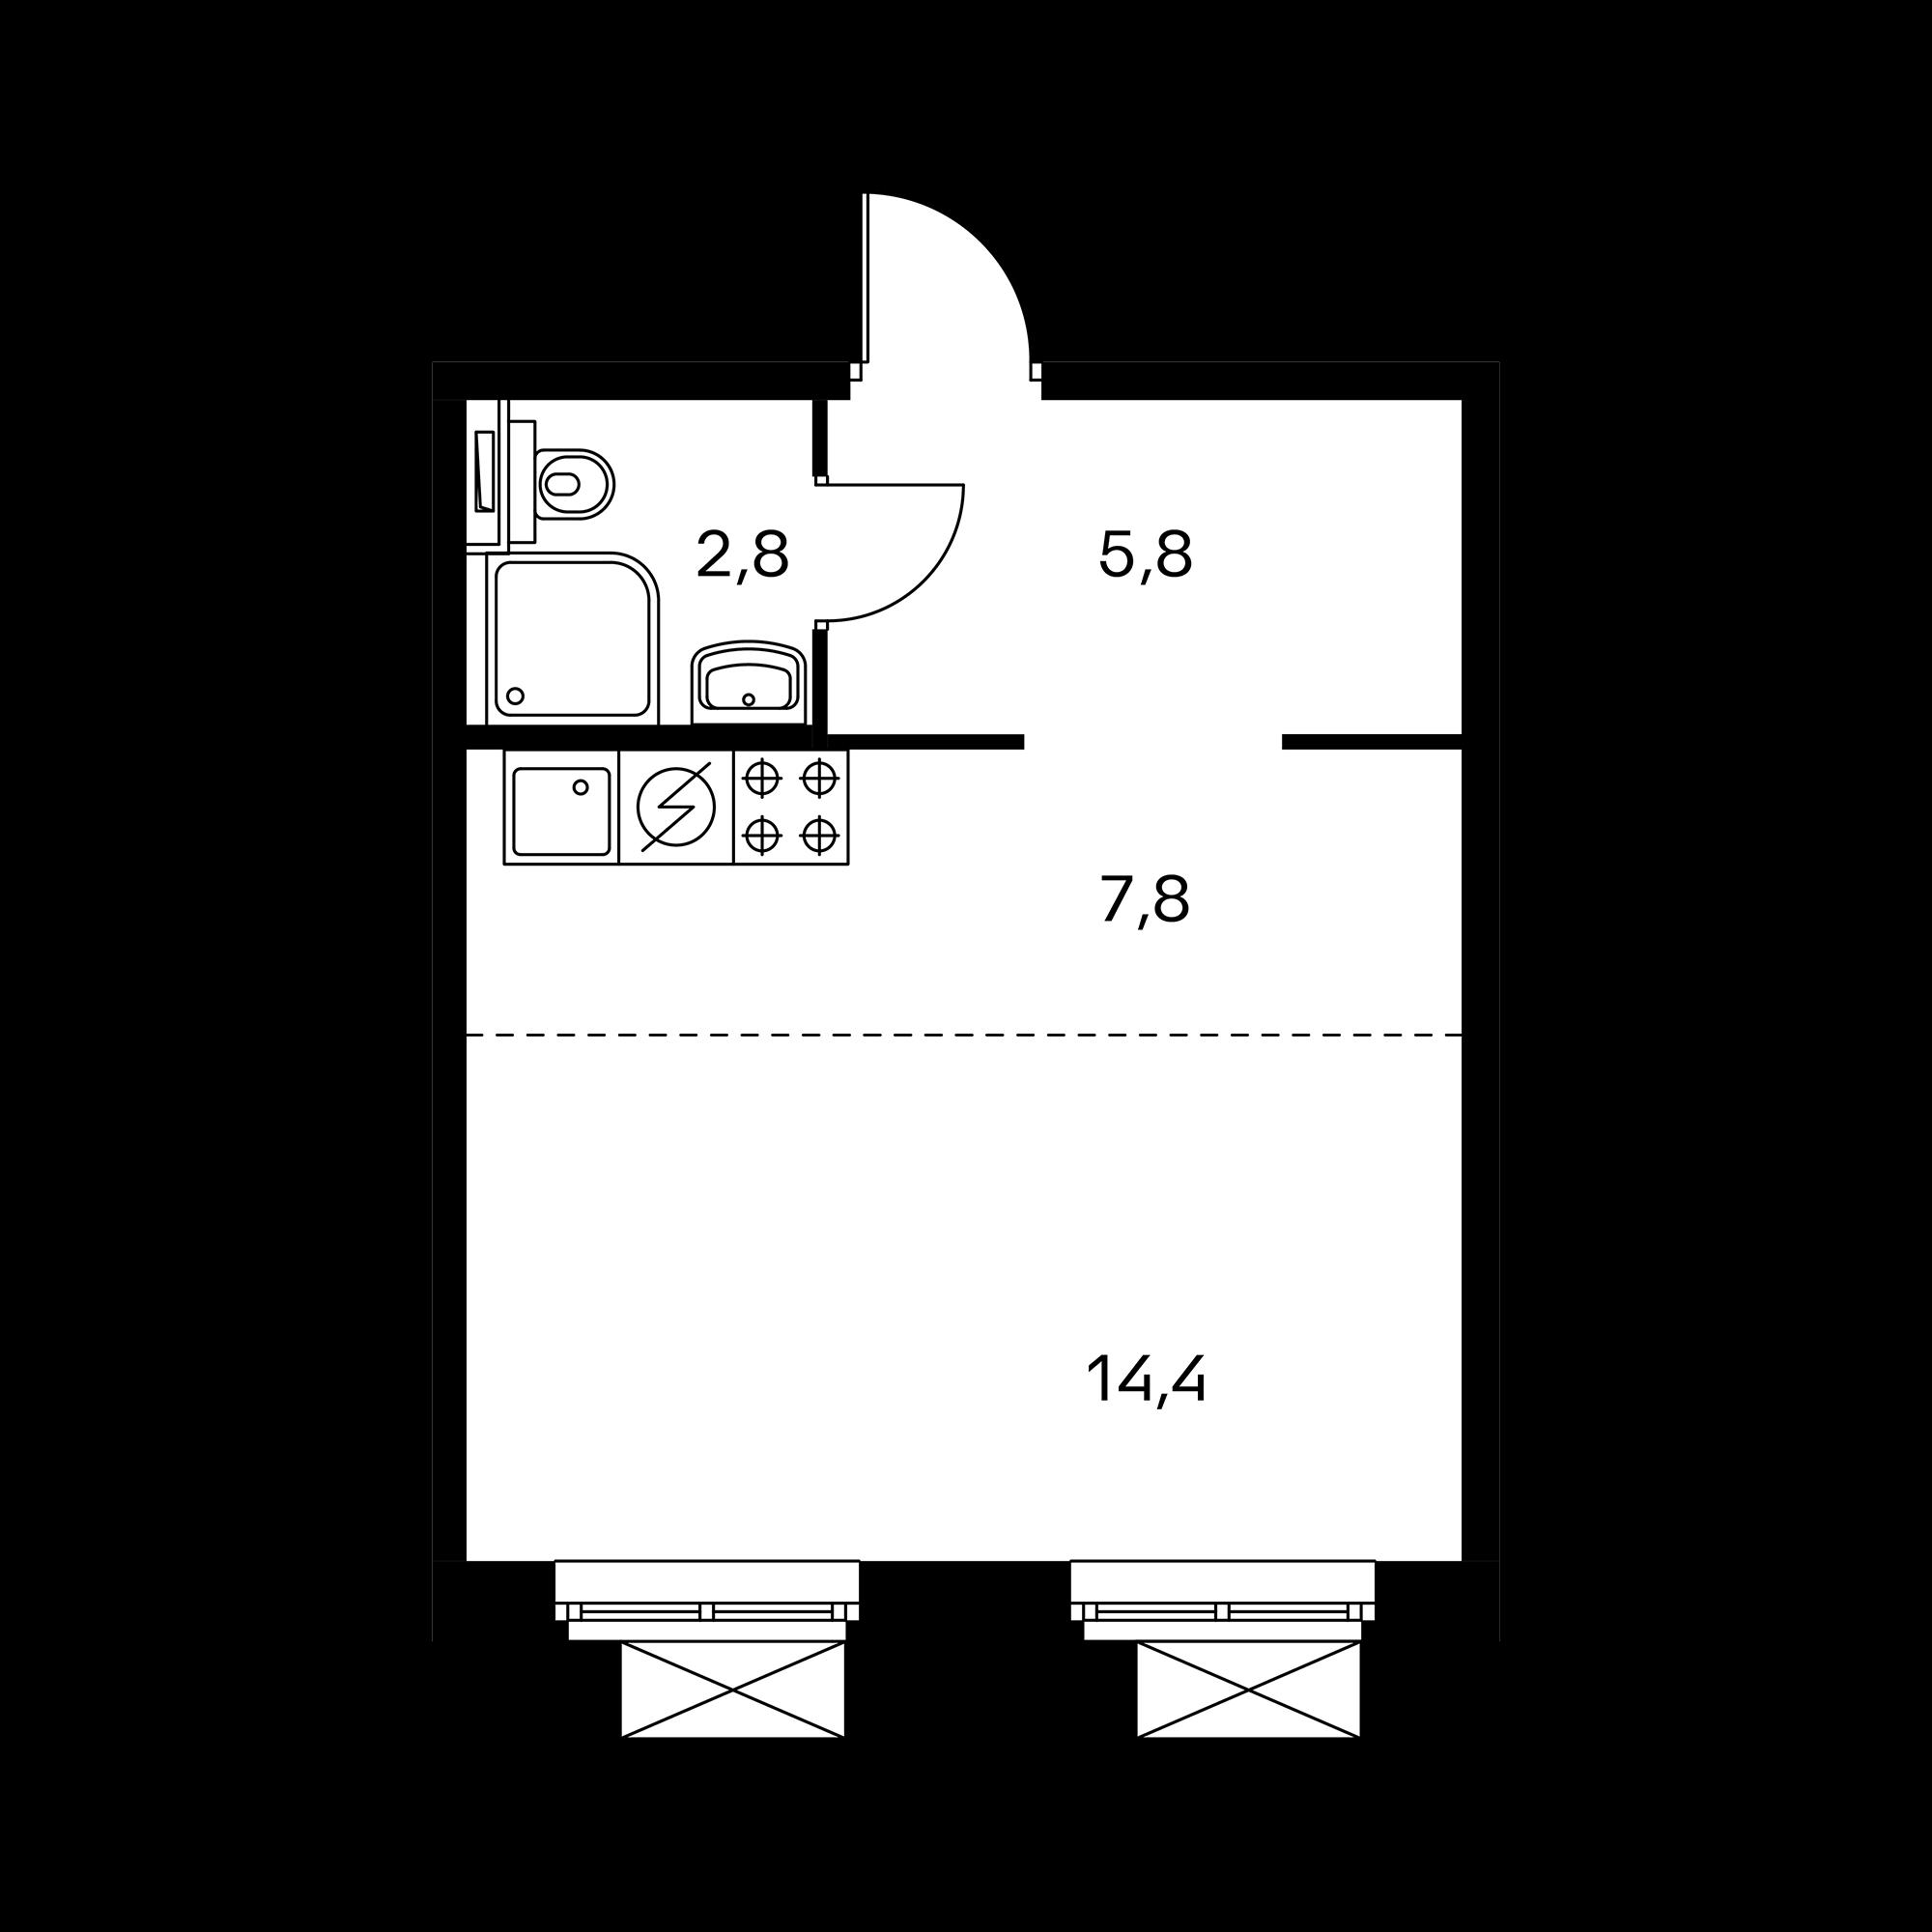 1NL1_5.4-1